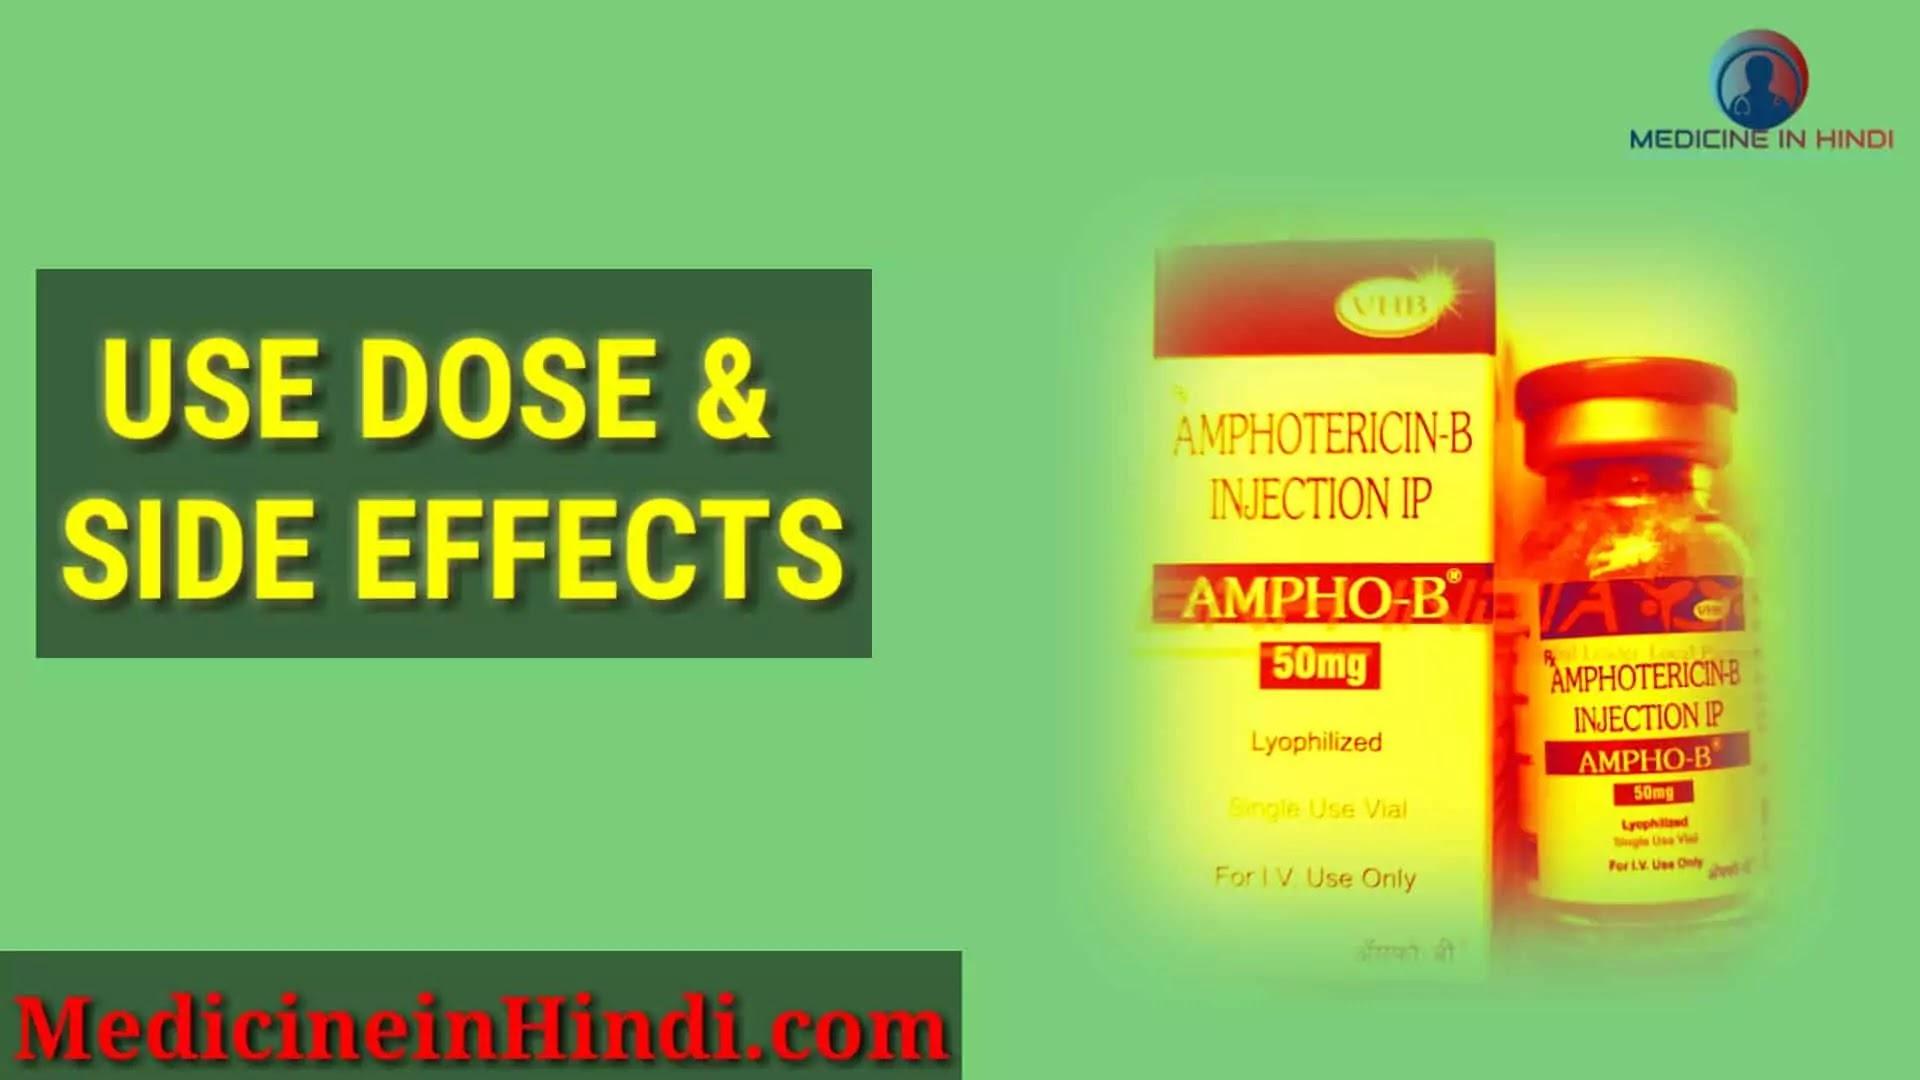 Ampho B 50mg Injection In HINDI | Amphotericin B injection uses In Hindi |